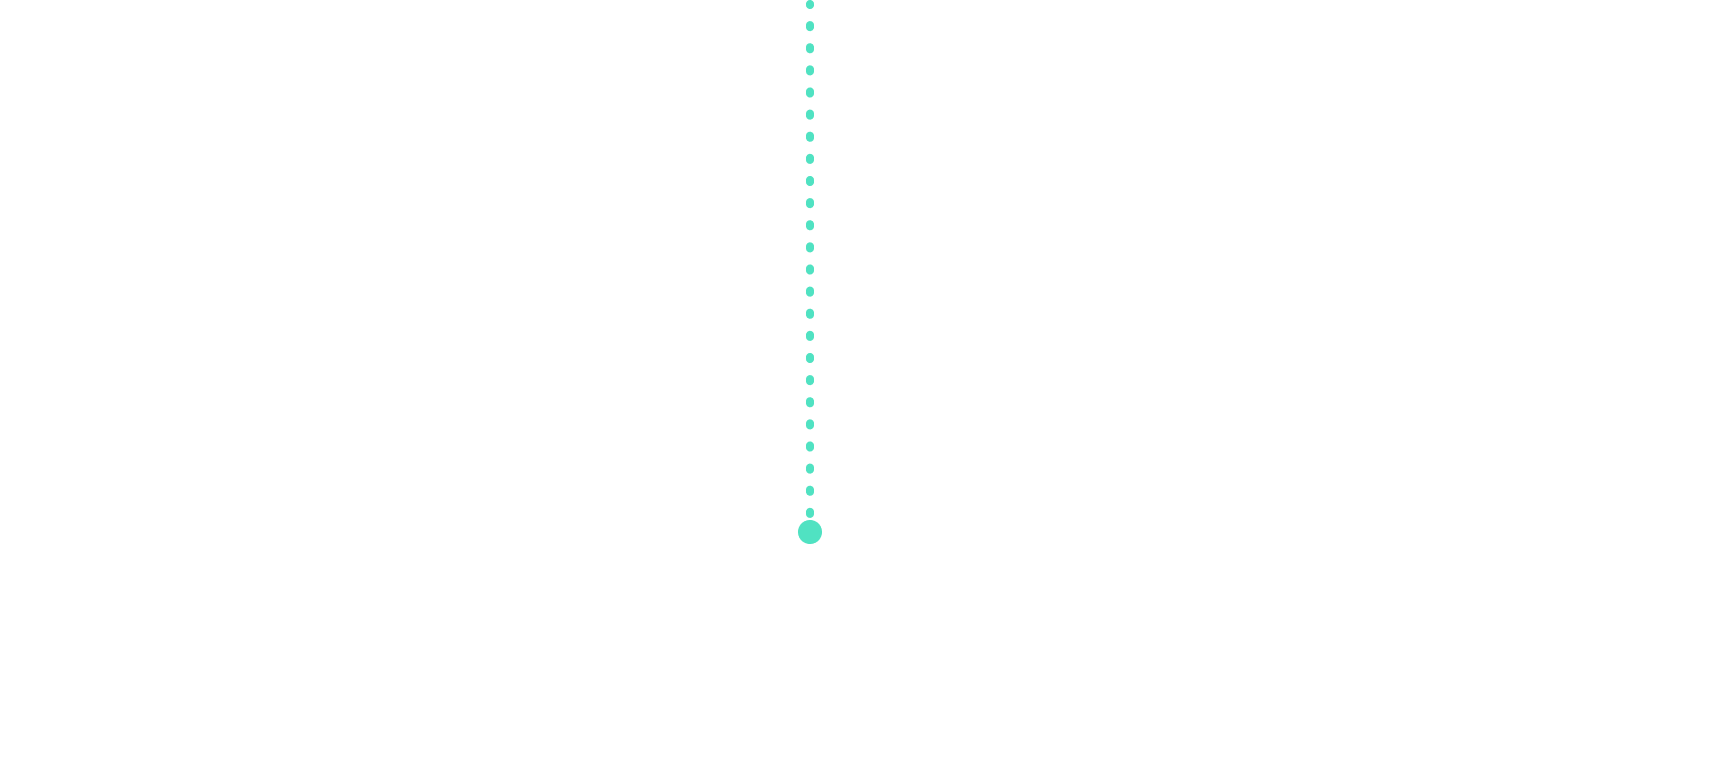 Step 1 - Lines